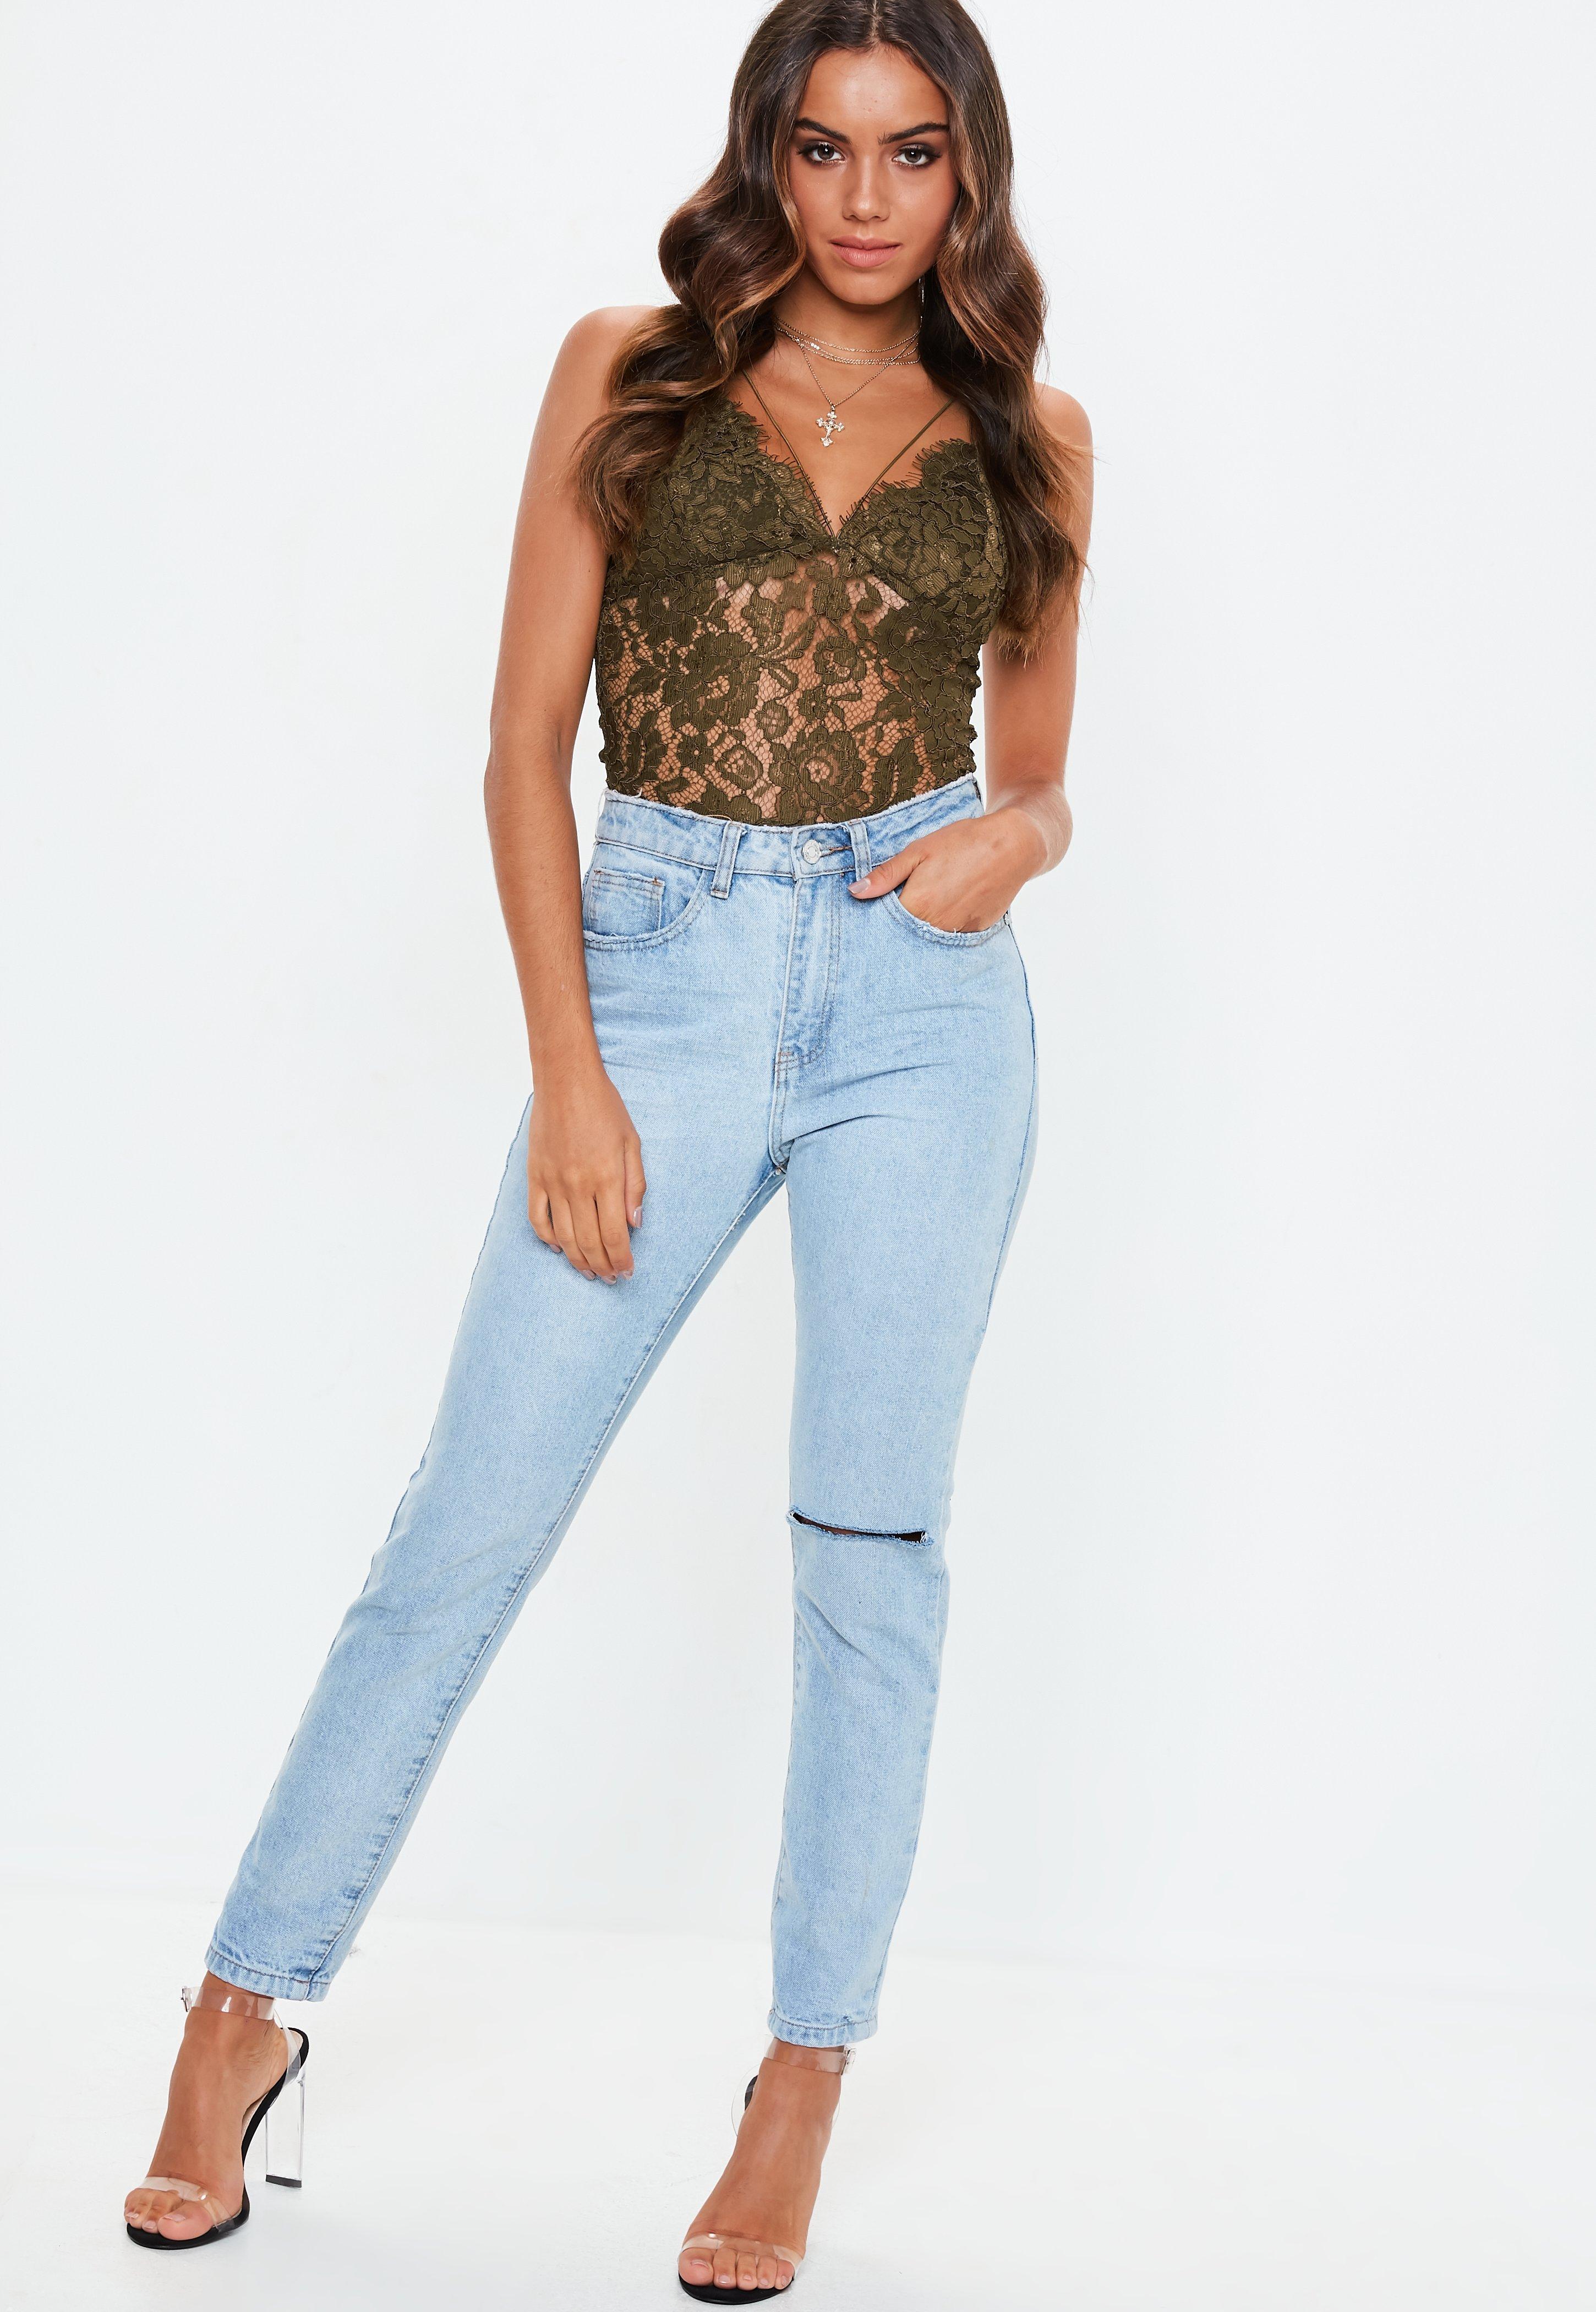 Missguided - Natural Khaki Corded Lace Bodysuit - Lyst. View fullscreen 0753e2d3a